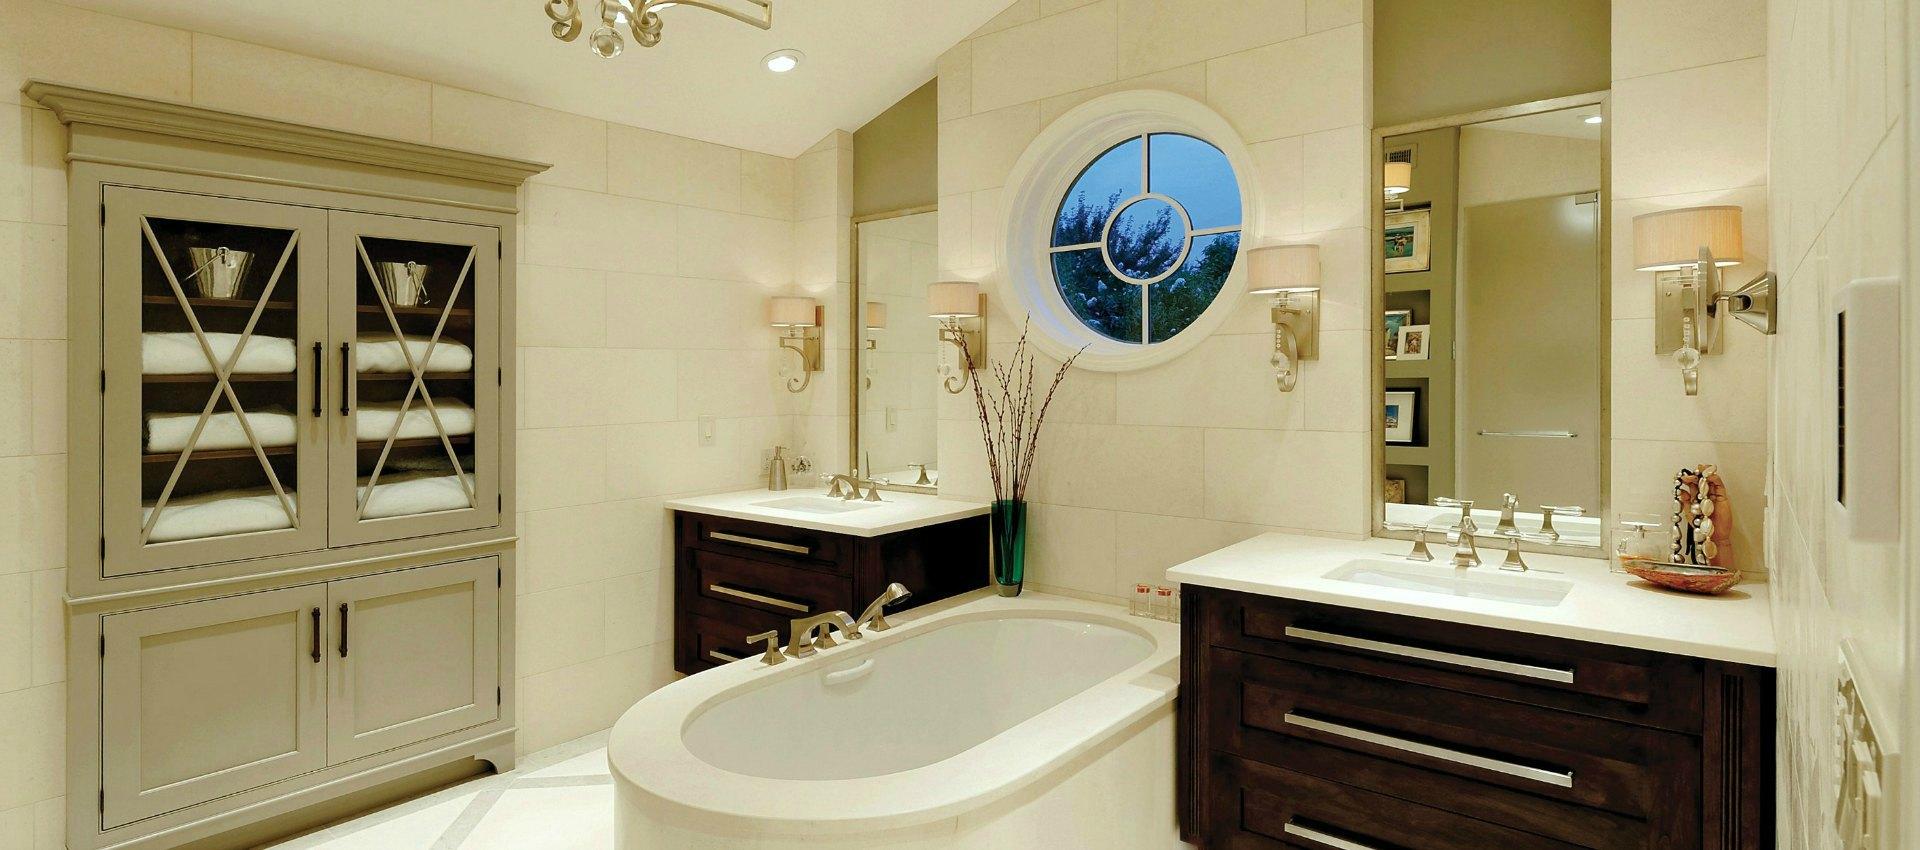 Alexandria VA | Custom Kitchens and Baths VA | MD | DC